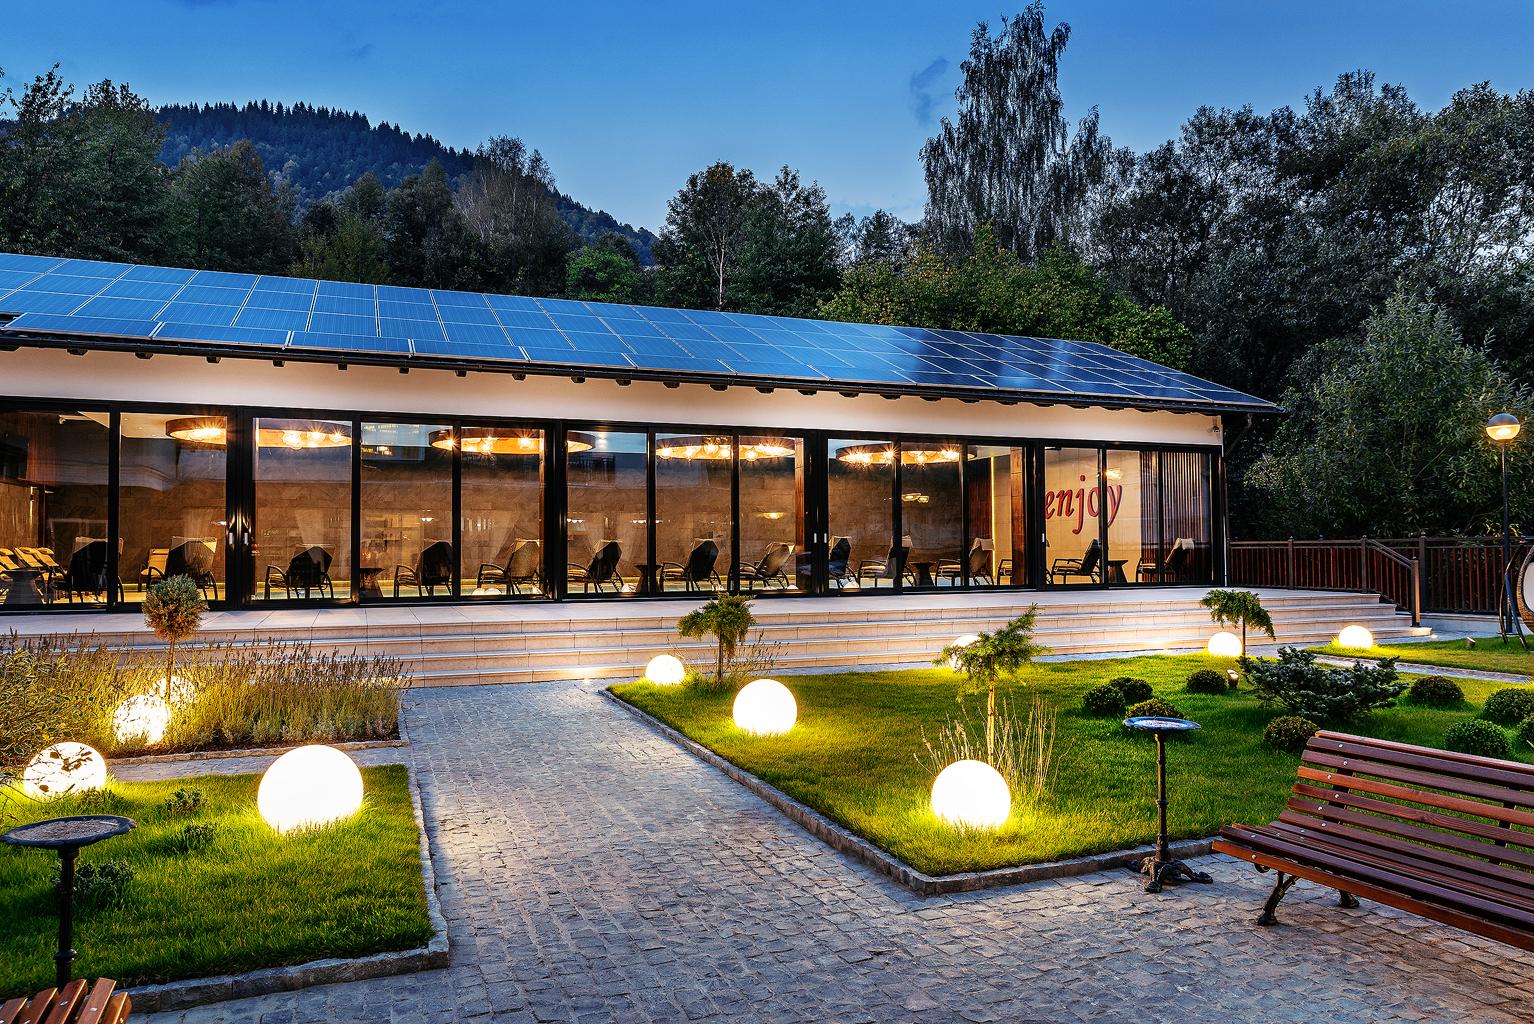 nord_hotel_curte-interioara-02_rsz1535